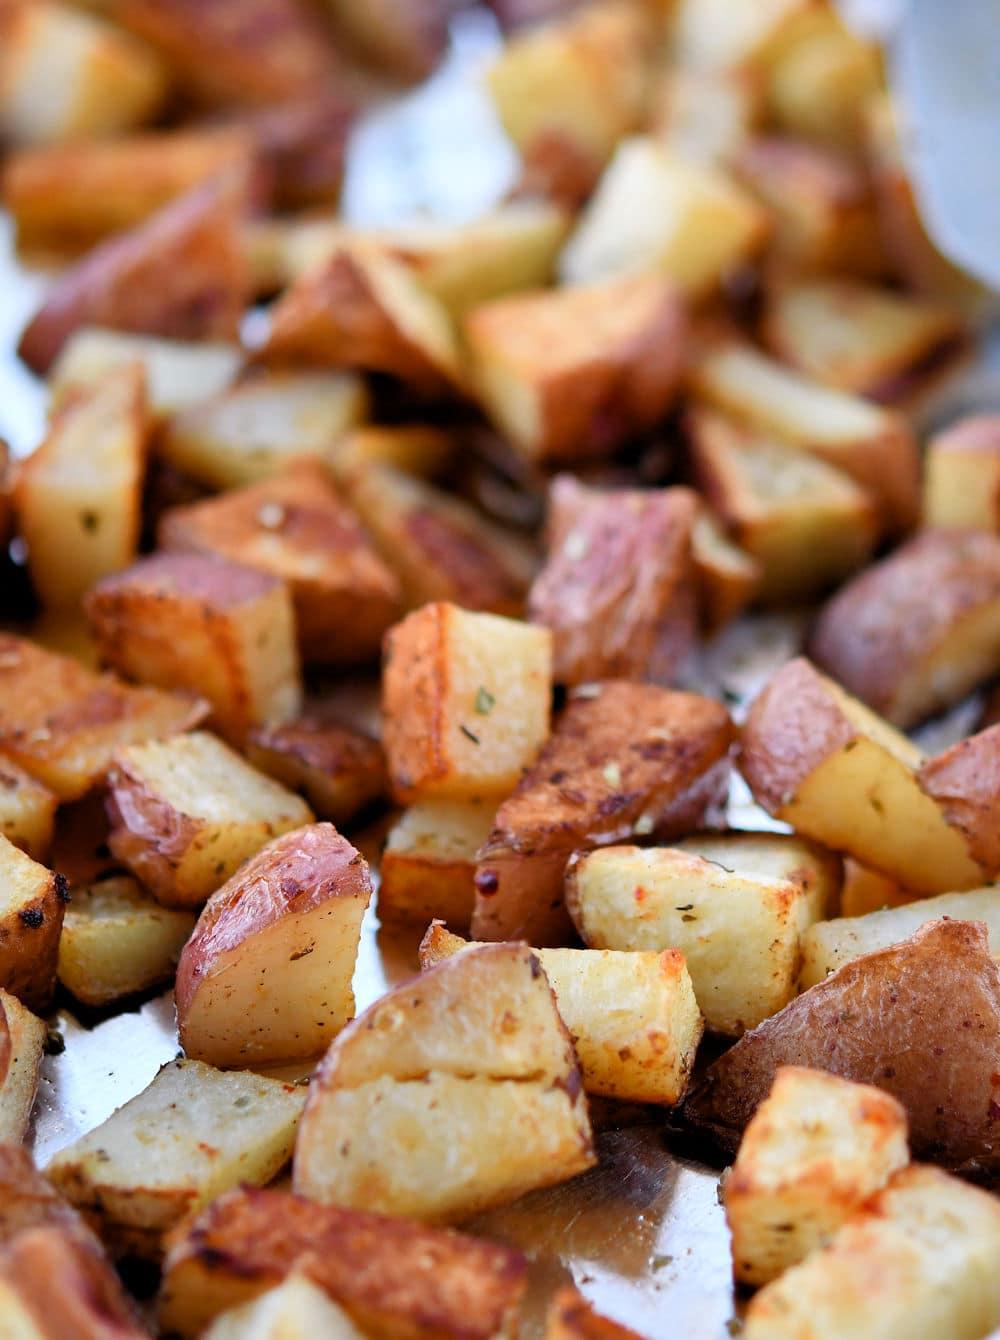 24Bite: Roasted Red Potatoes Recipe by Christian Guzman